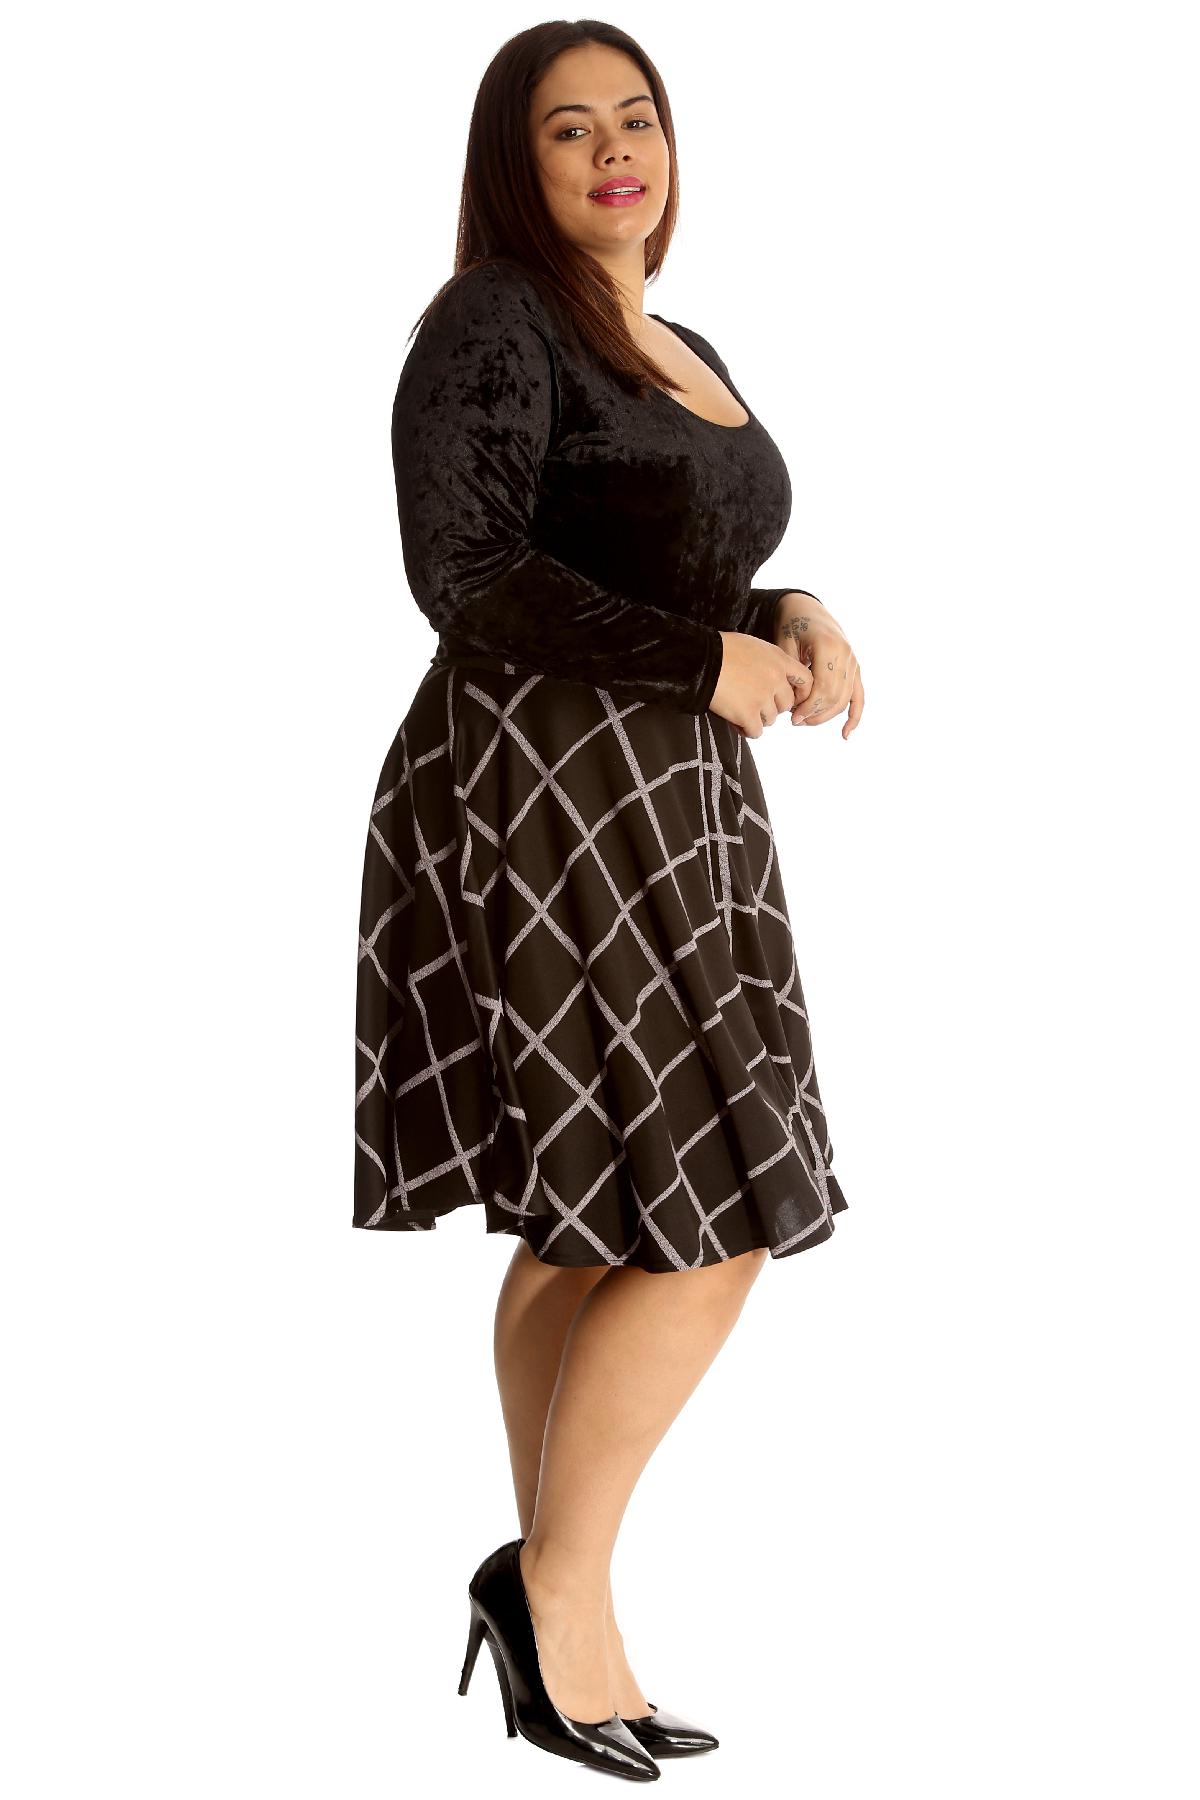 Kleidung & Accessoires Damenmode New Womens Plus Size Skirt Ladies Skater Tartan Check Print Knee Long Elastic